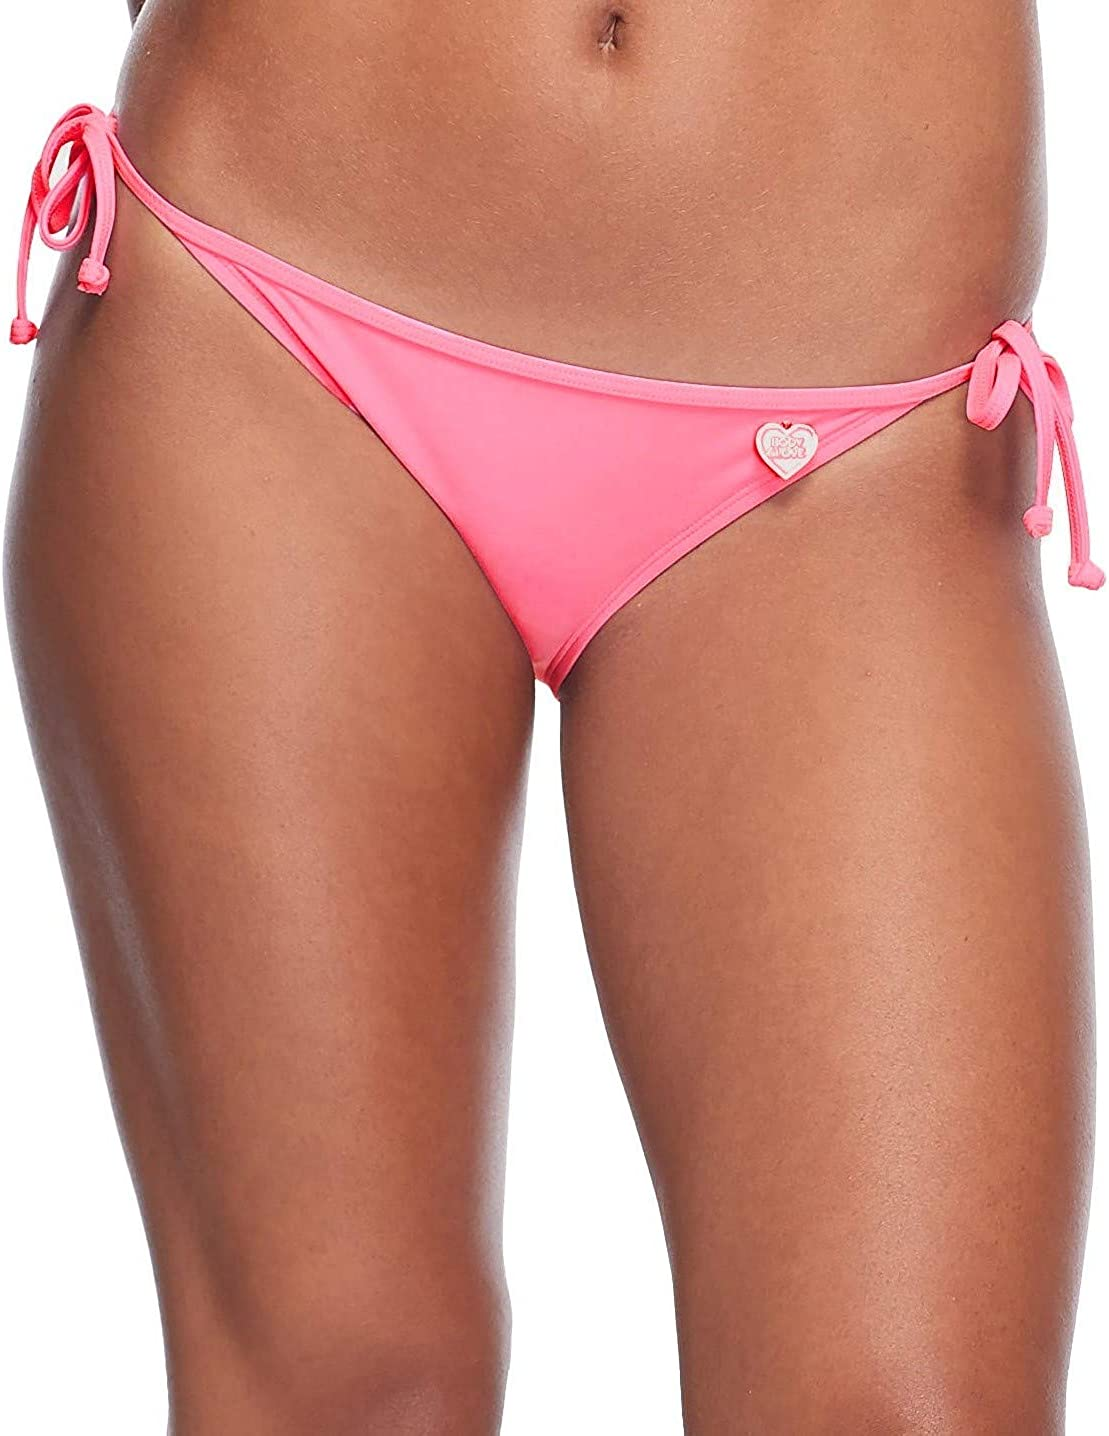 Body Glove Womens Smoothies Tie Side Solid Fuller Coverage Bikini Bottom Swimsuit Bikini Bottoms